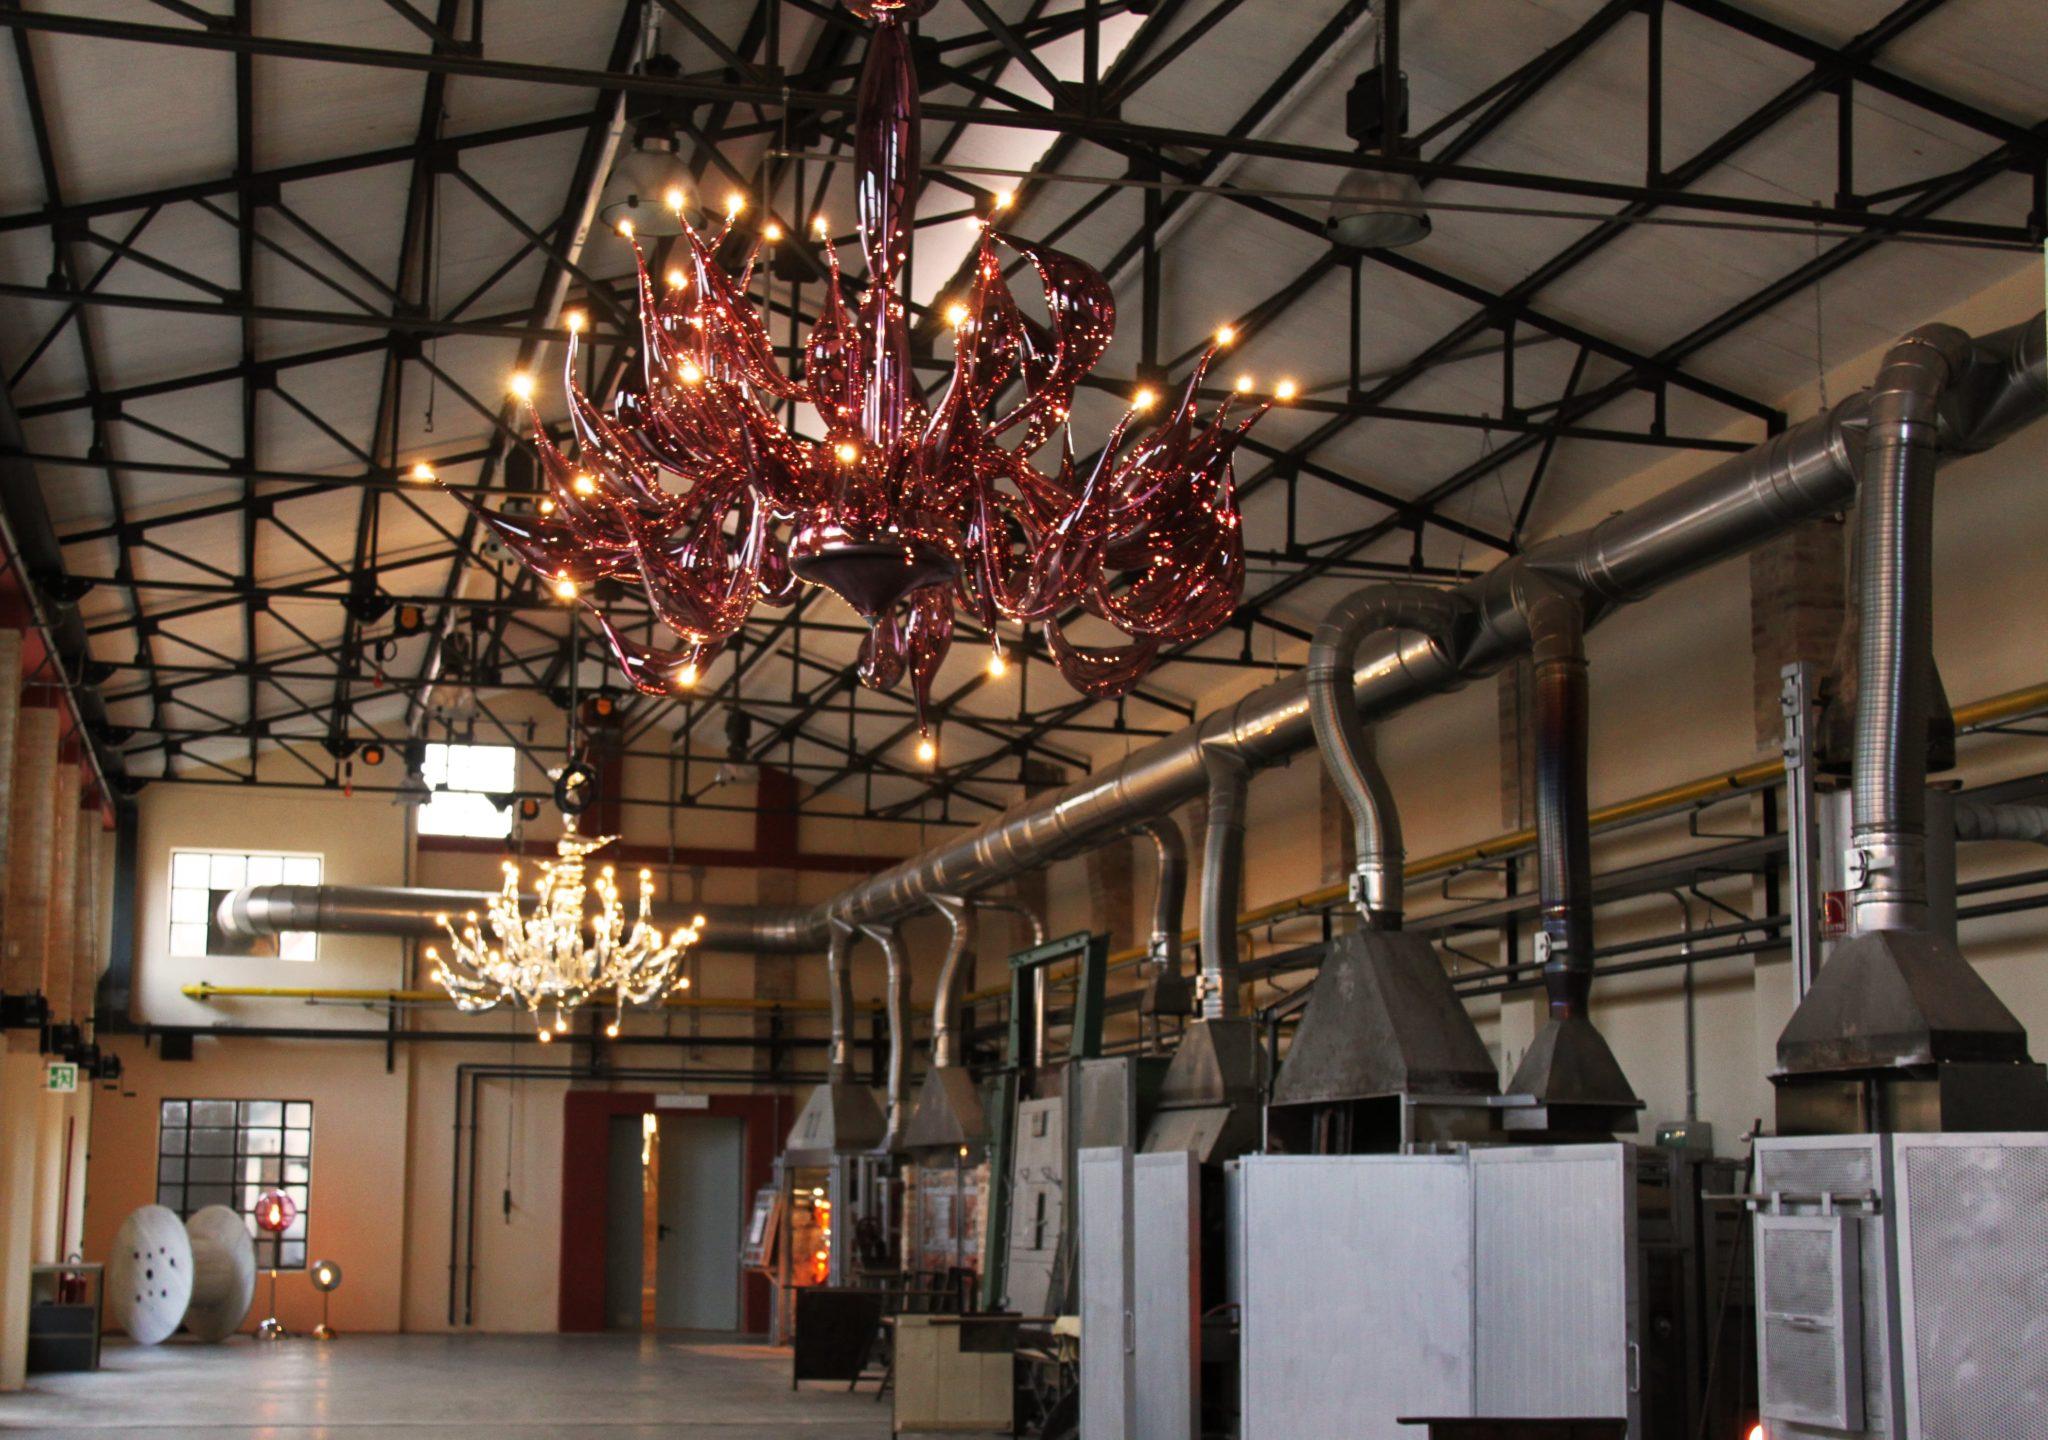 the-venice-glass-week-vetro-artistico-murano-glass-festival-blowing-light